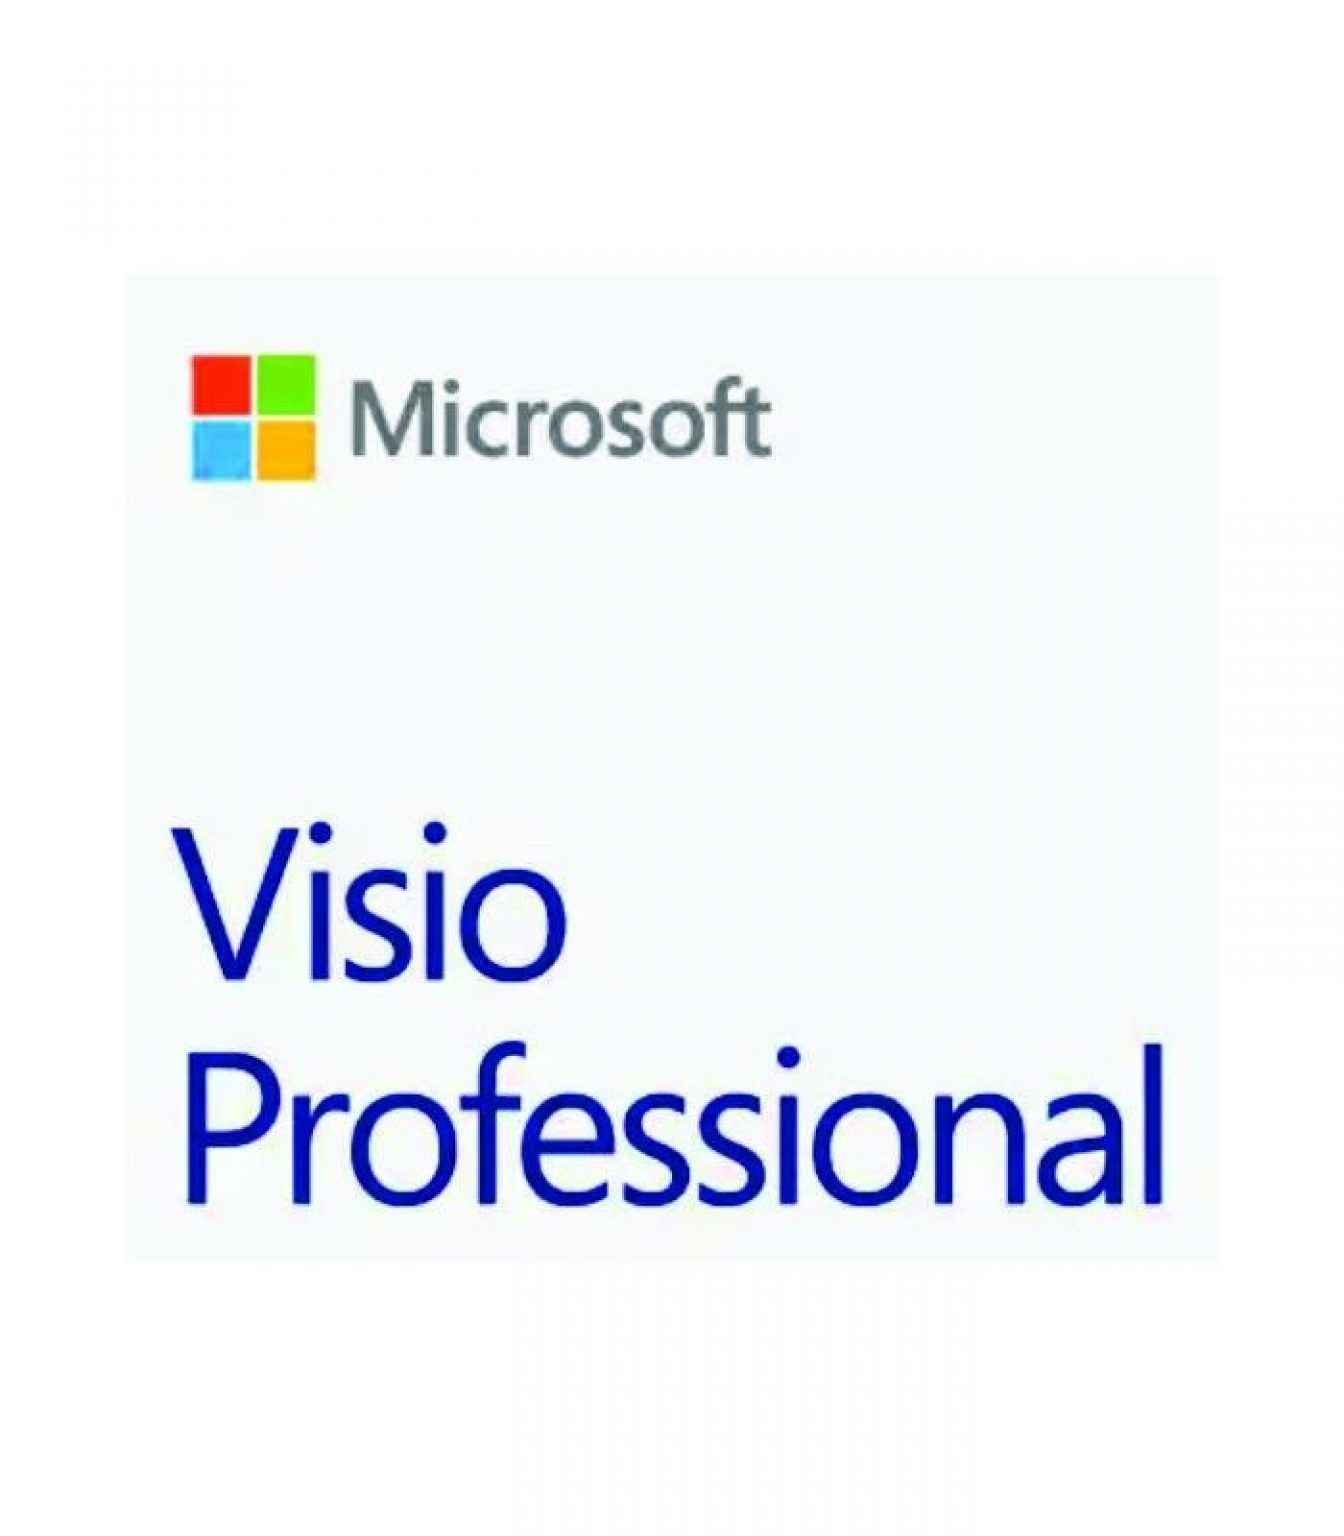 MICROSOFT - [Visio Professional]VisioPro 2019 OLP NL Gov[Pemerintah]